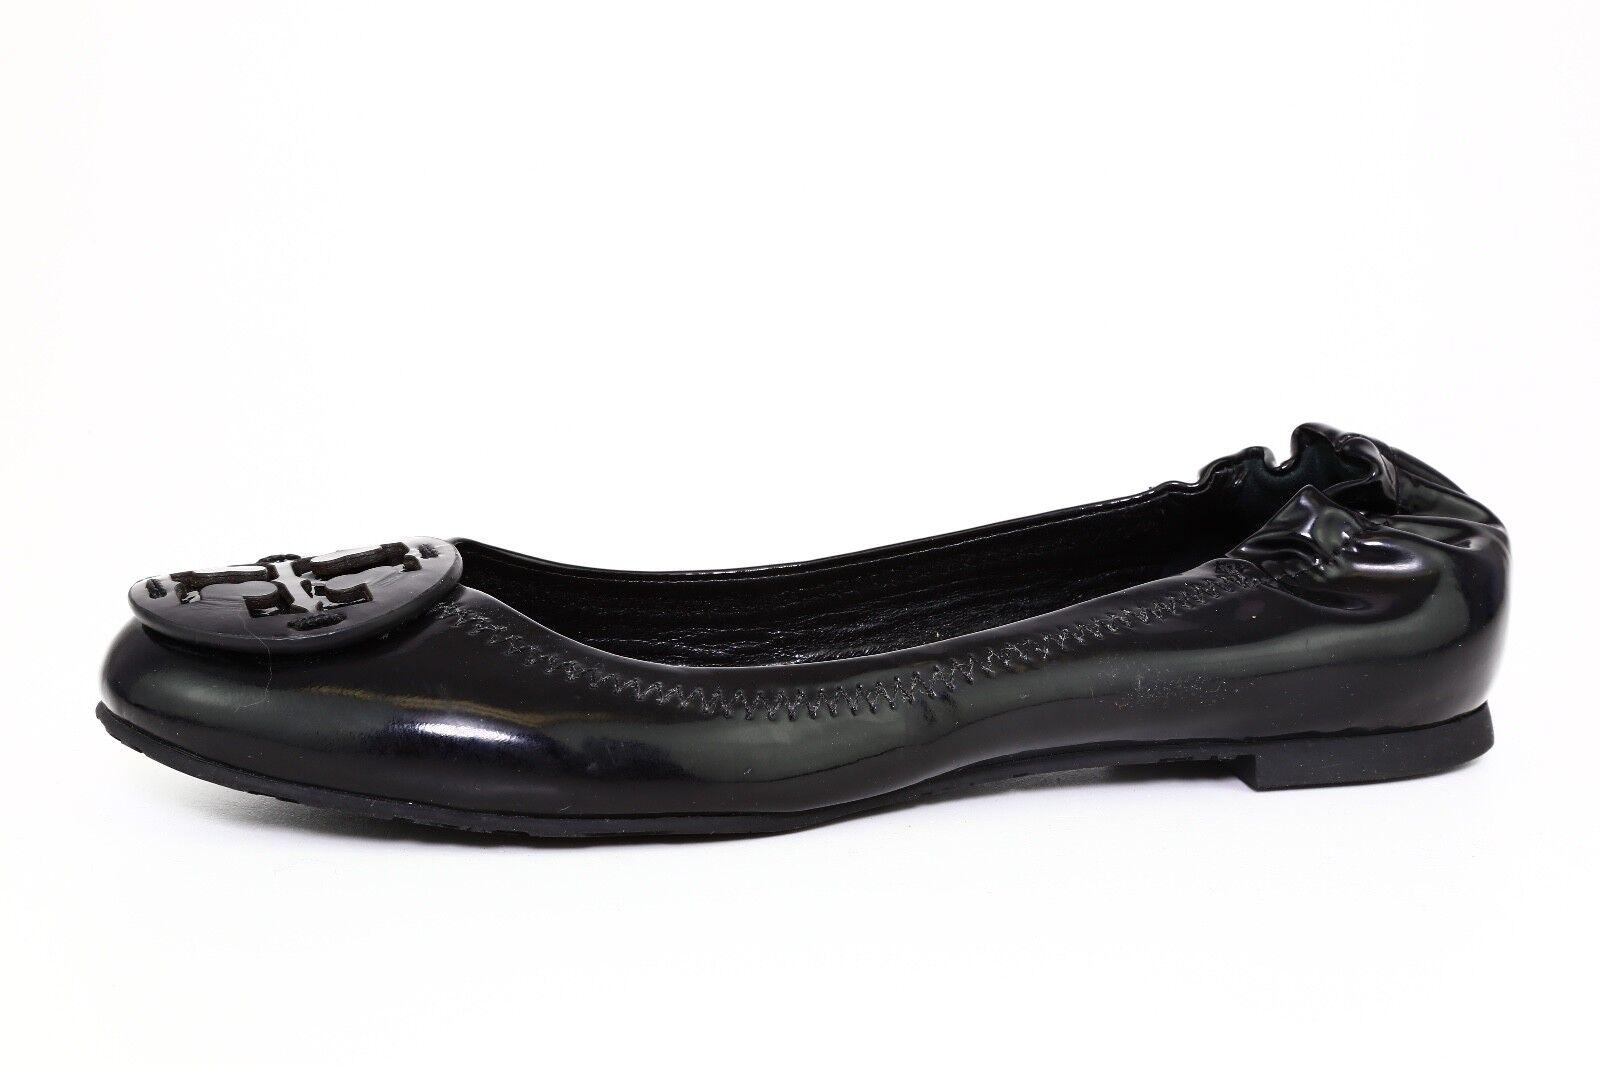 Tory Burch Reva Patent Leather Ballet Flats Black Women Sz 5.5 M 3644